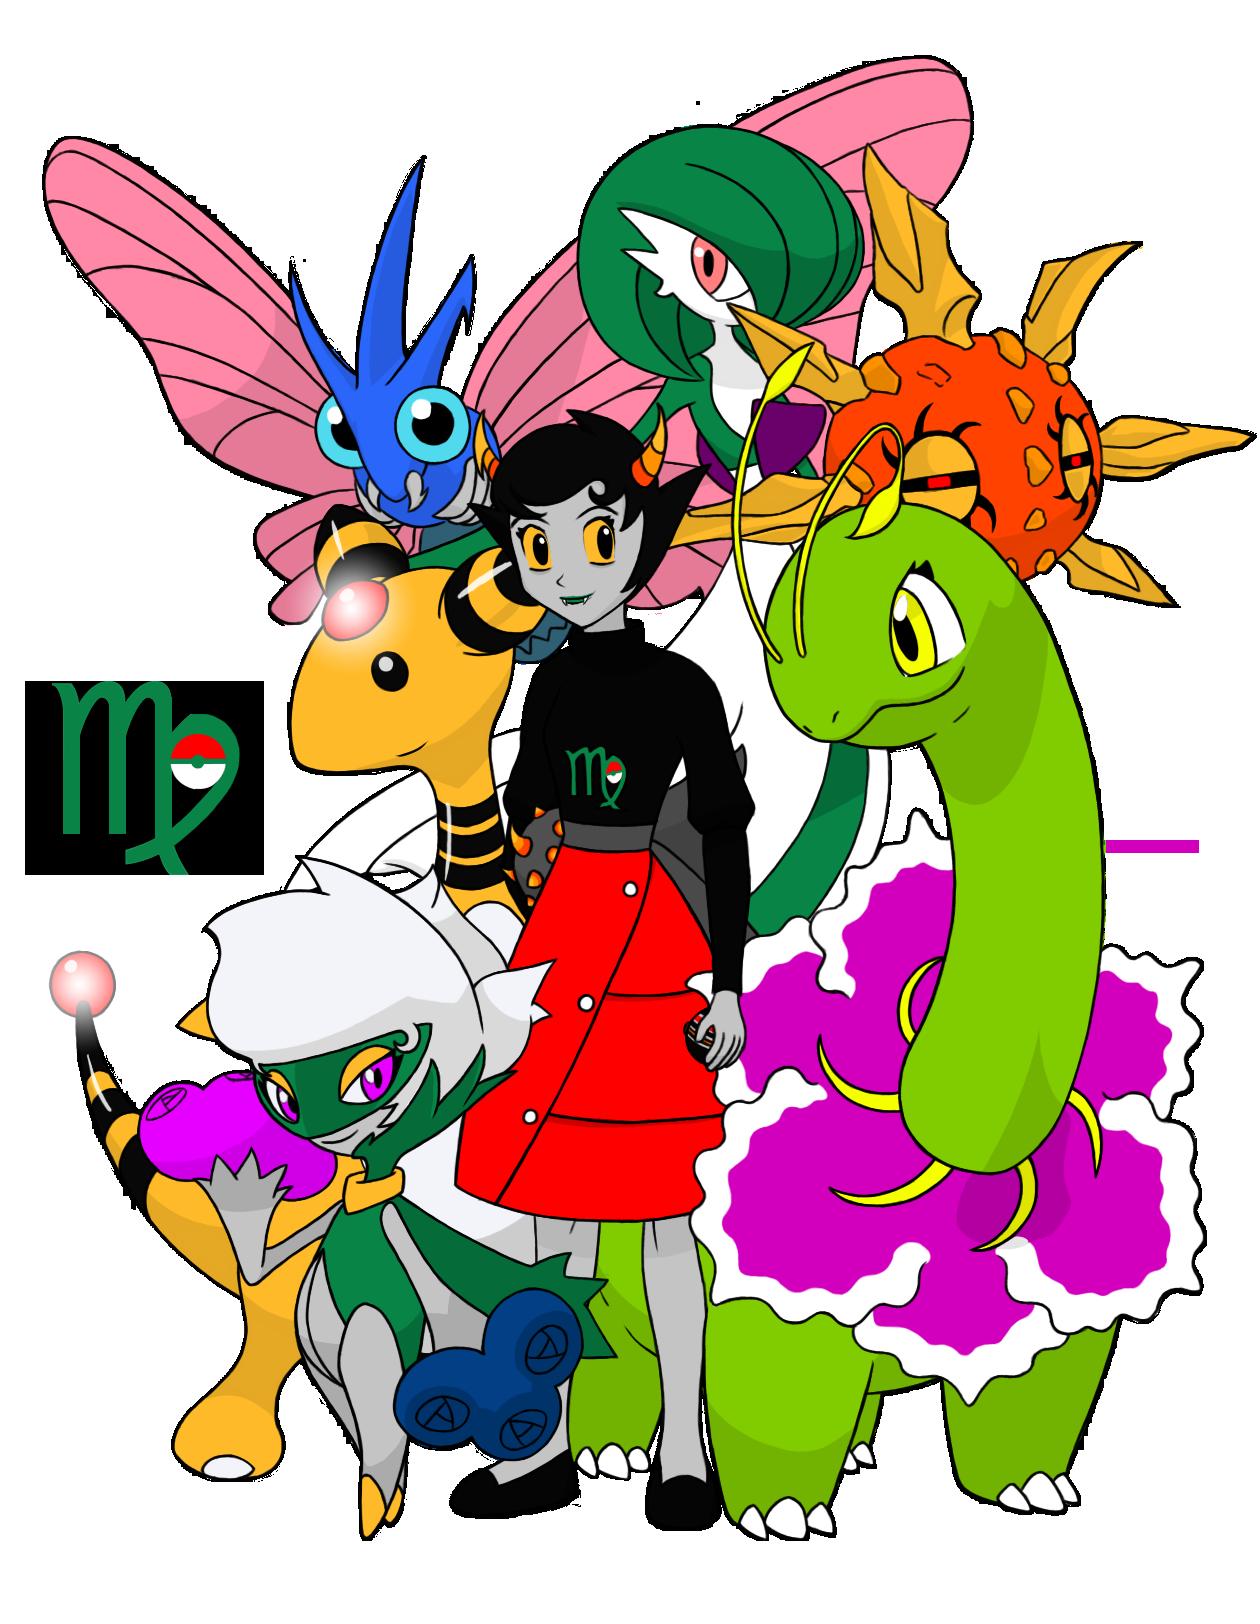 Homestuck-Pokémon Crossover Part 3 - Kanaya